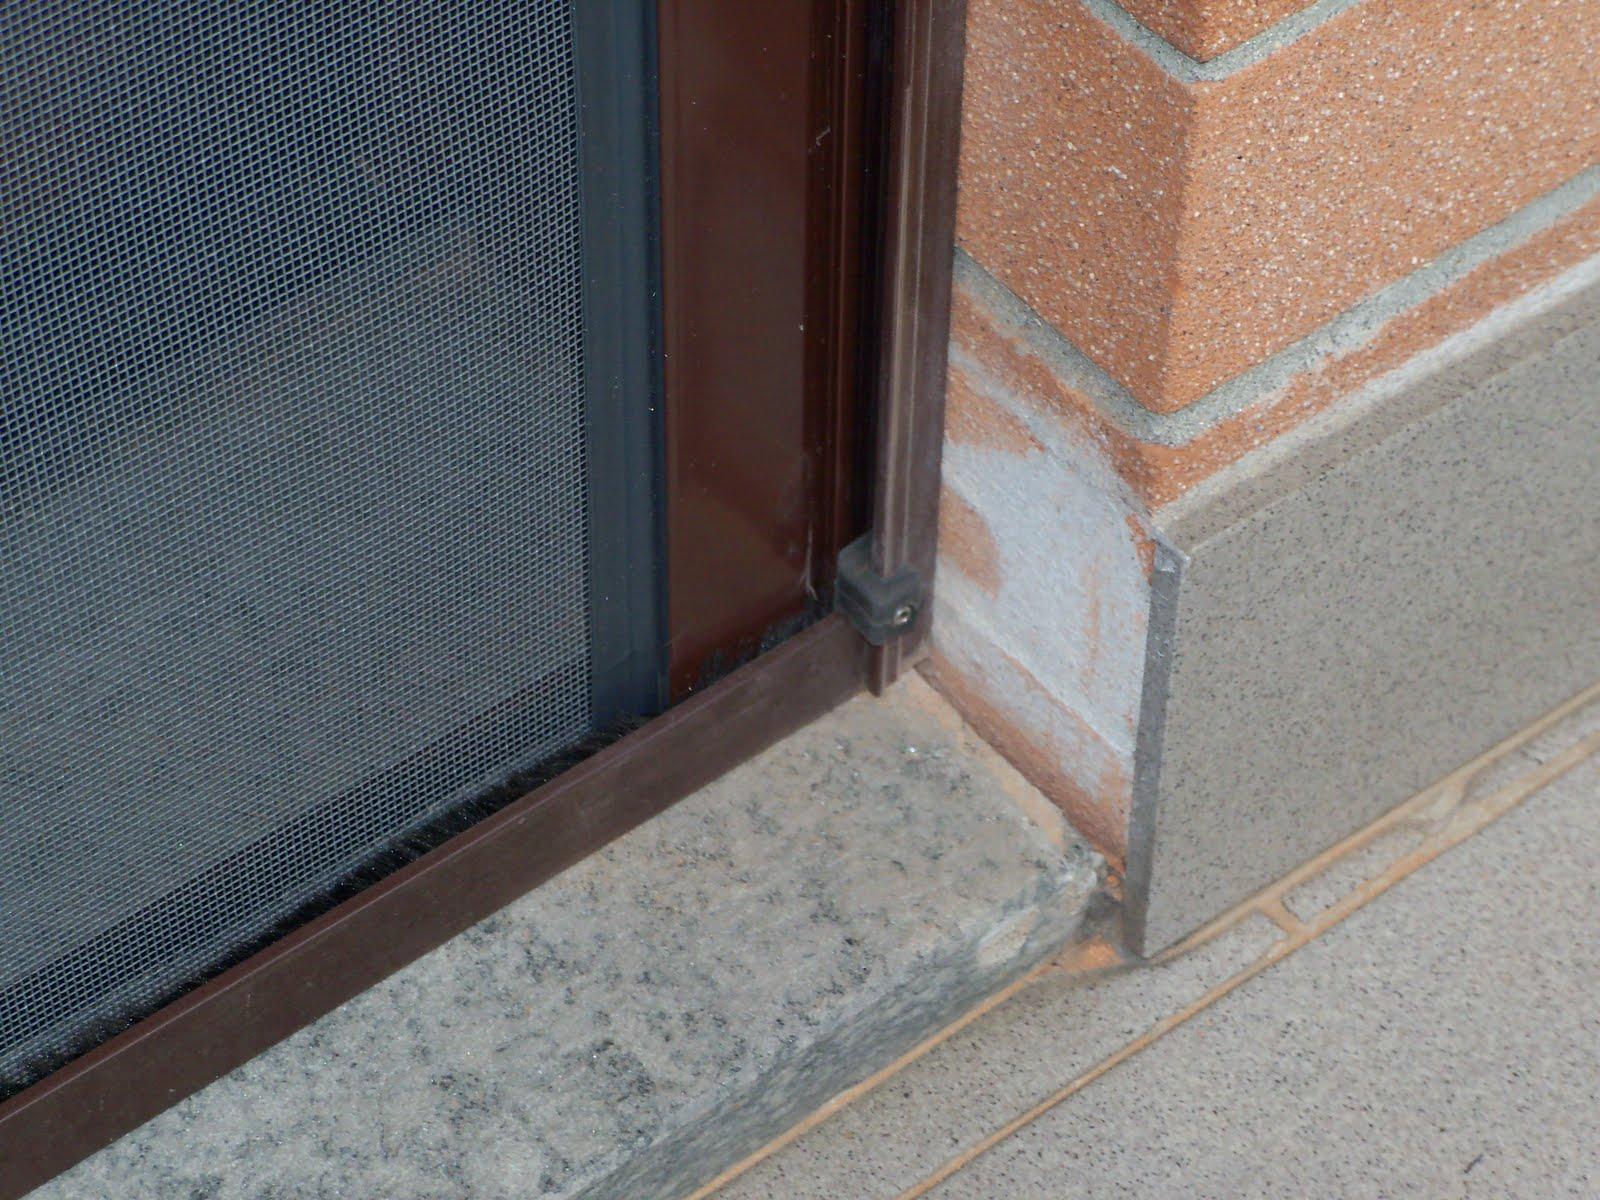 Tende da sole a torino m f 01119714234 zanzariera classica da portafinestra vs zanzariera - Zanzariere porta finestra prezzi ...